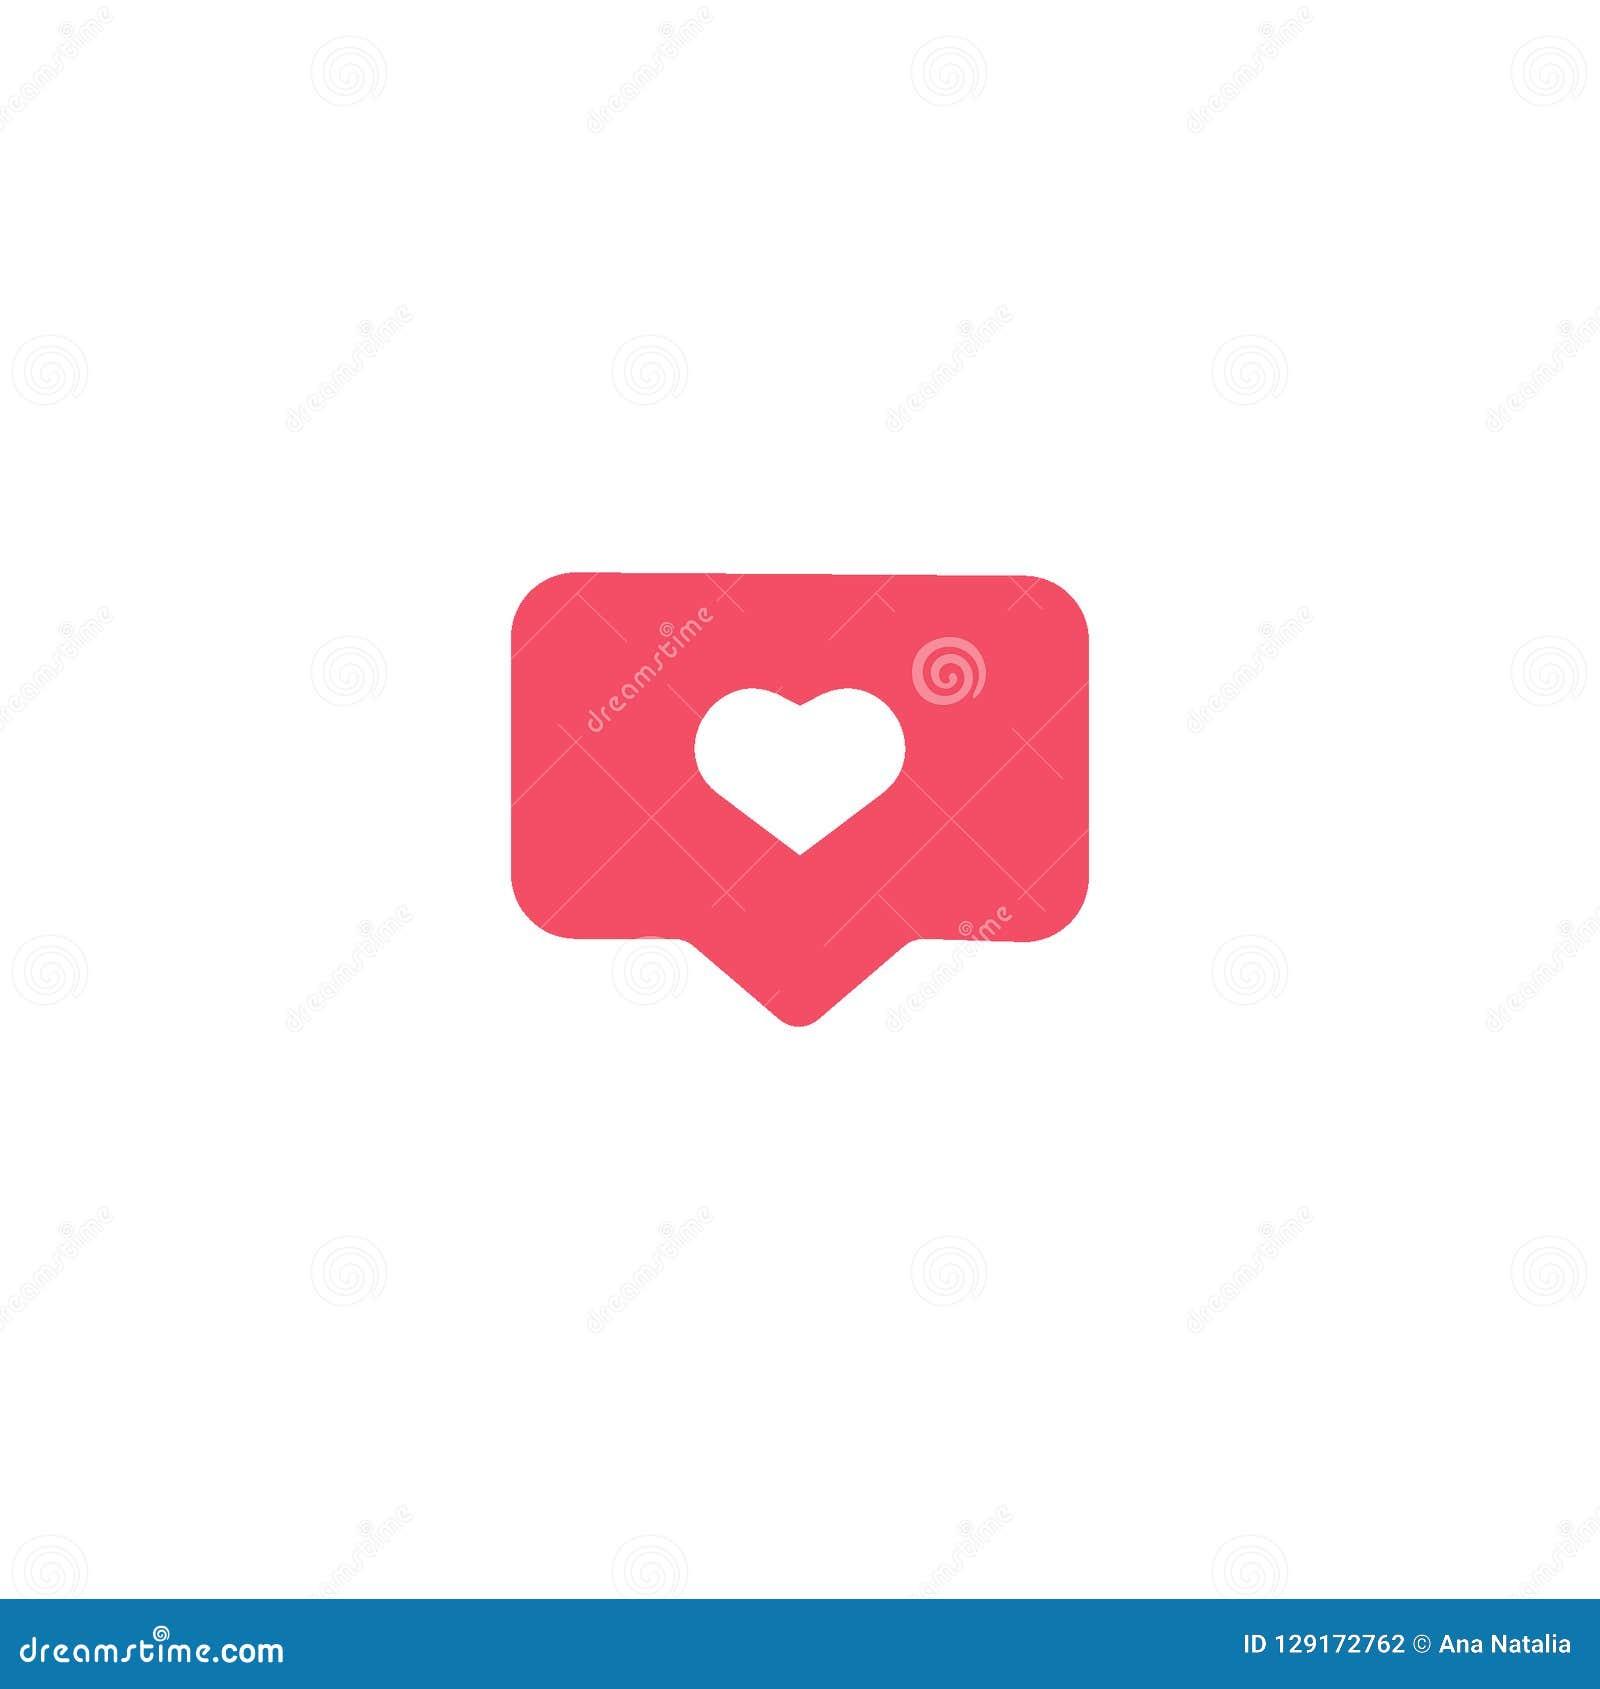 Instagram Heart Stock Illustrations 2 635 Instagram Heart Stock Illustrations Vectors Clipart Dreamstime